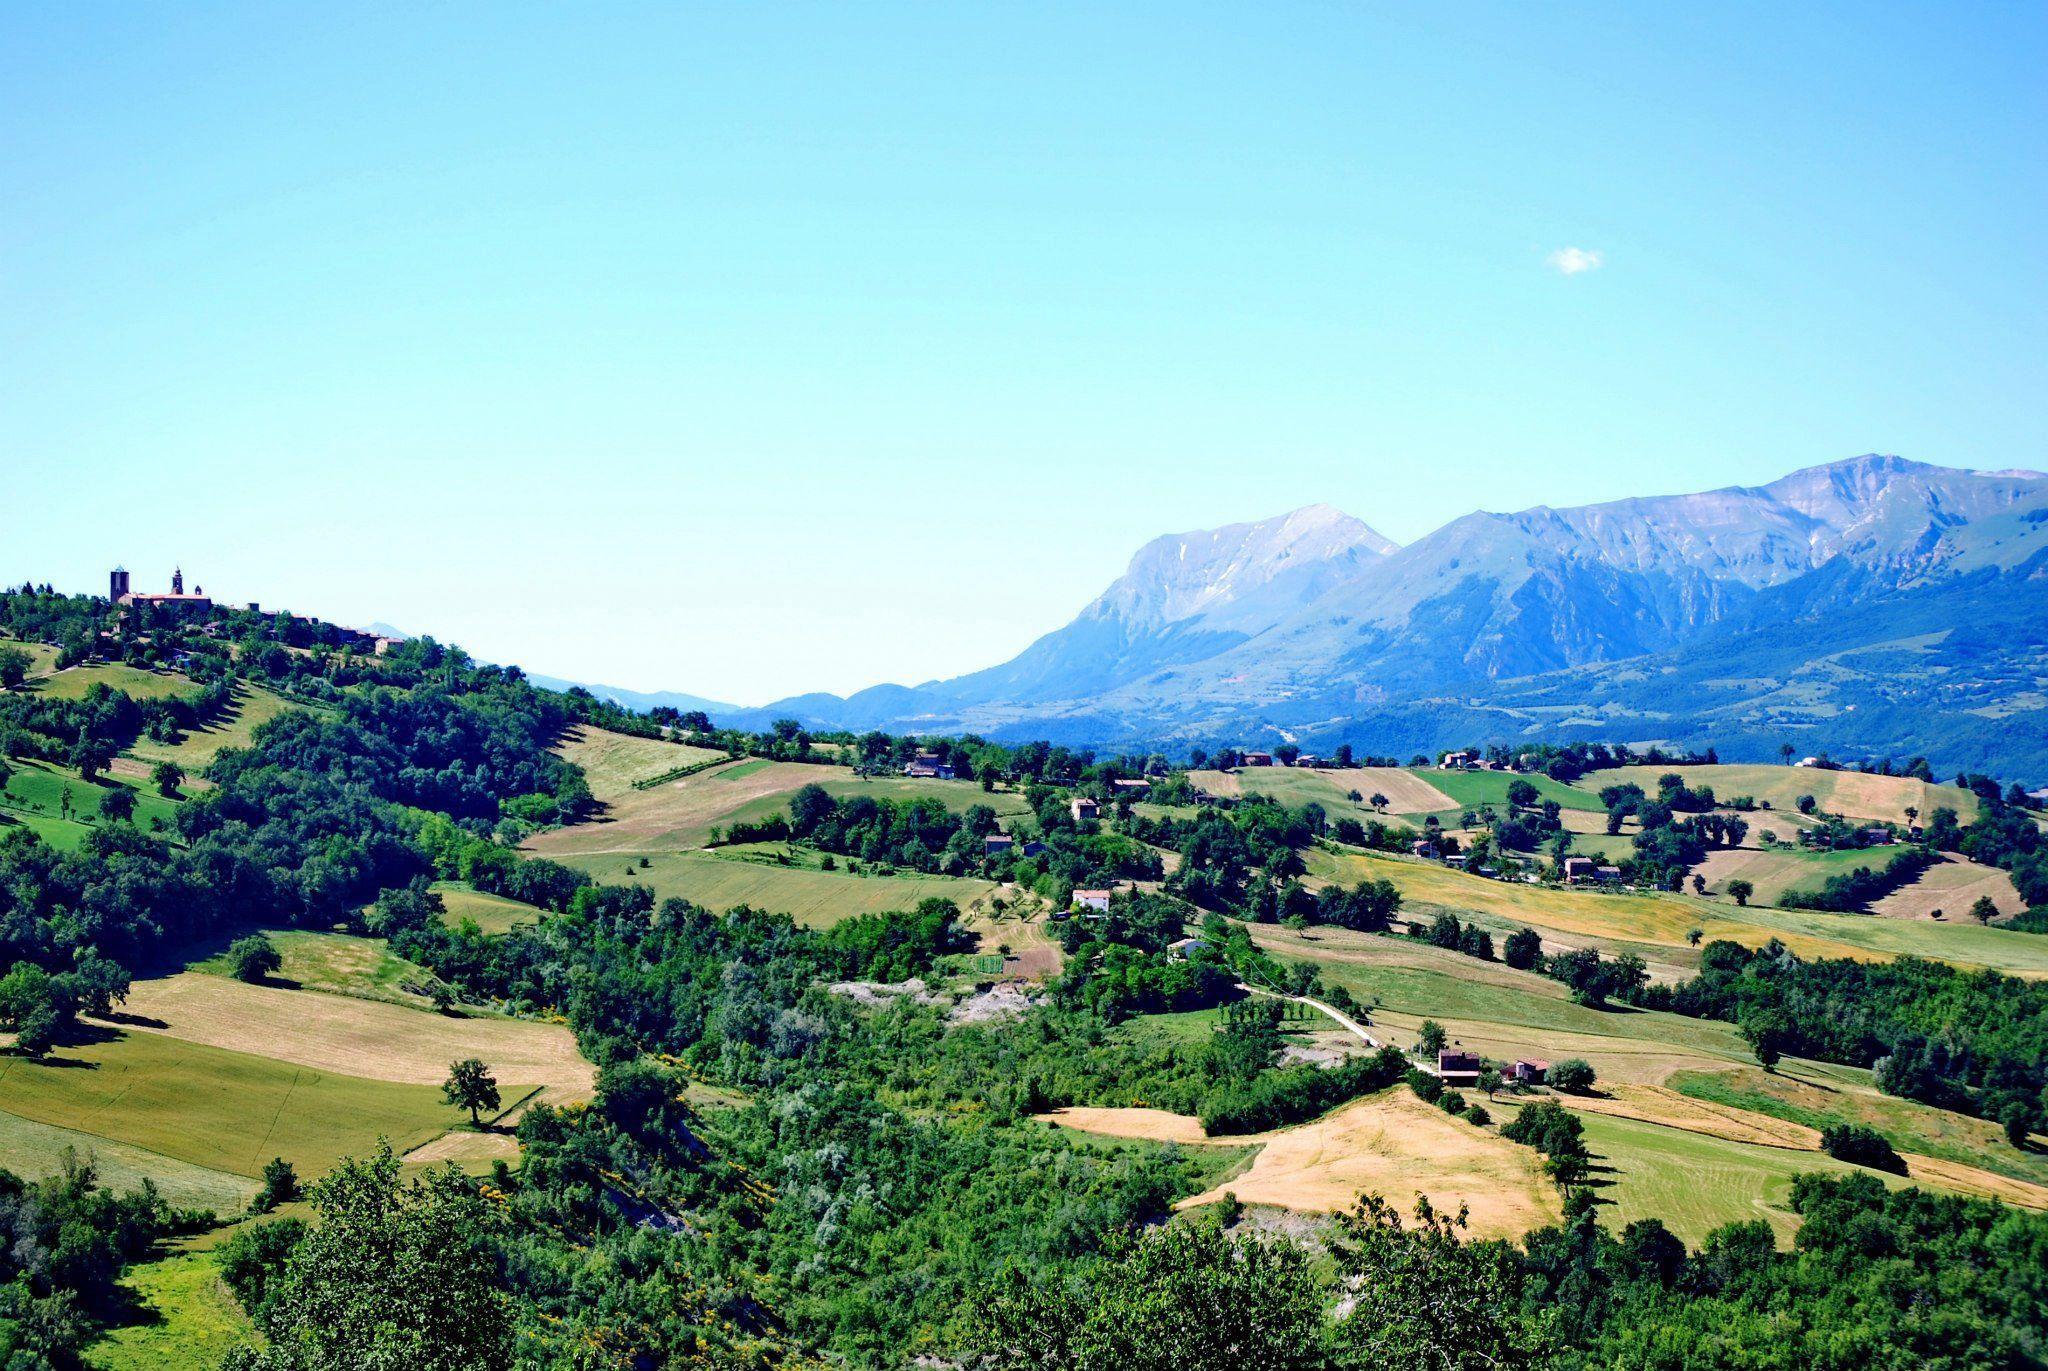 http://www.hotelsinmarche.com/agriturismo-elisei  Panoramica di #Gualdo di #Macerata